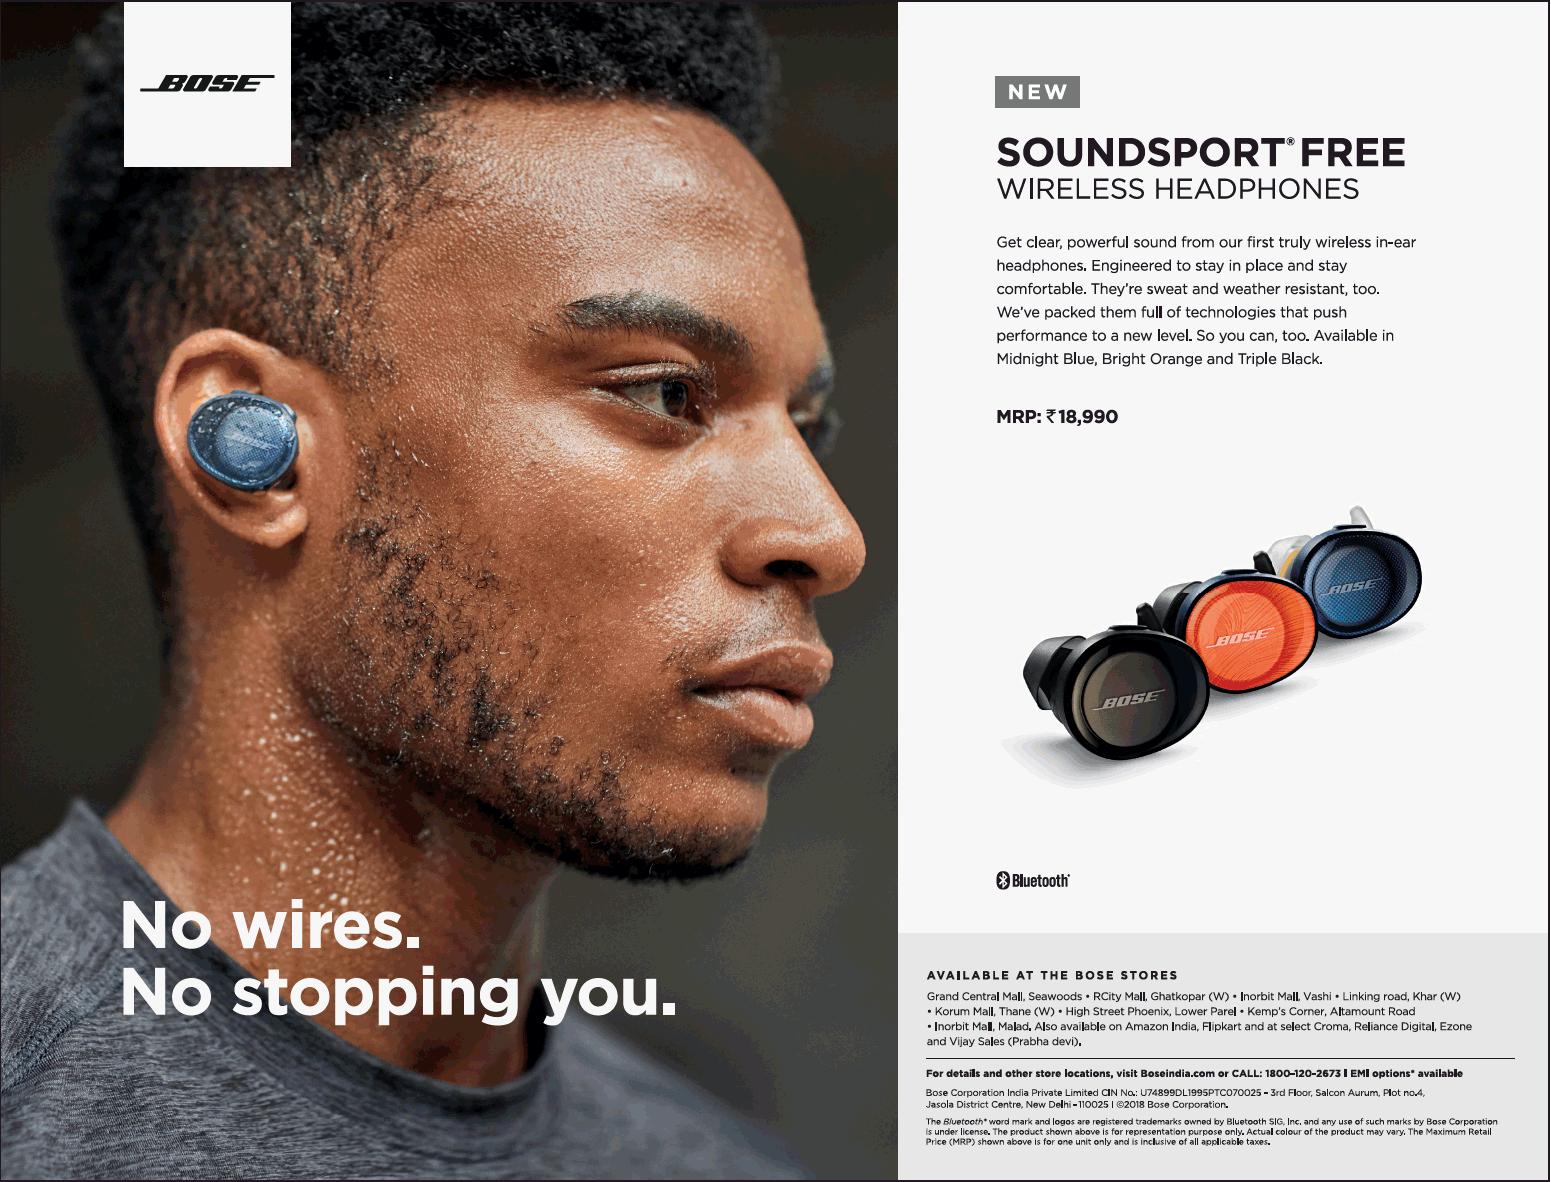 Bose Headphones Soundsport Free No Wires Stopping You Ad Advert Wireless Earphone Orange